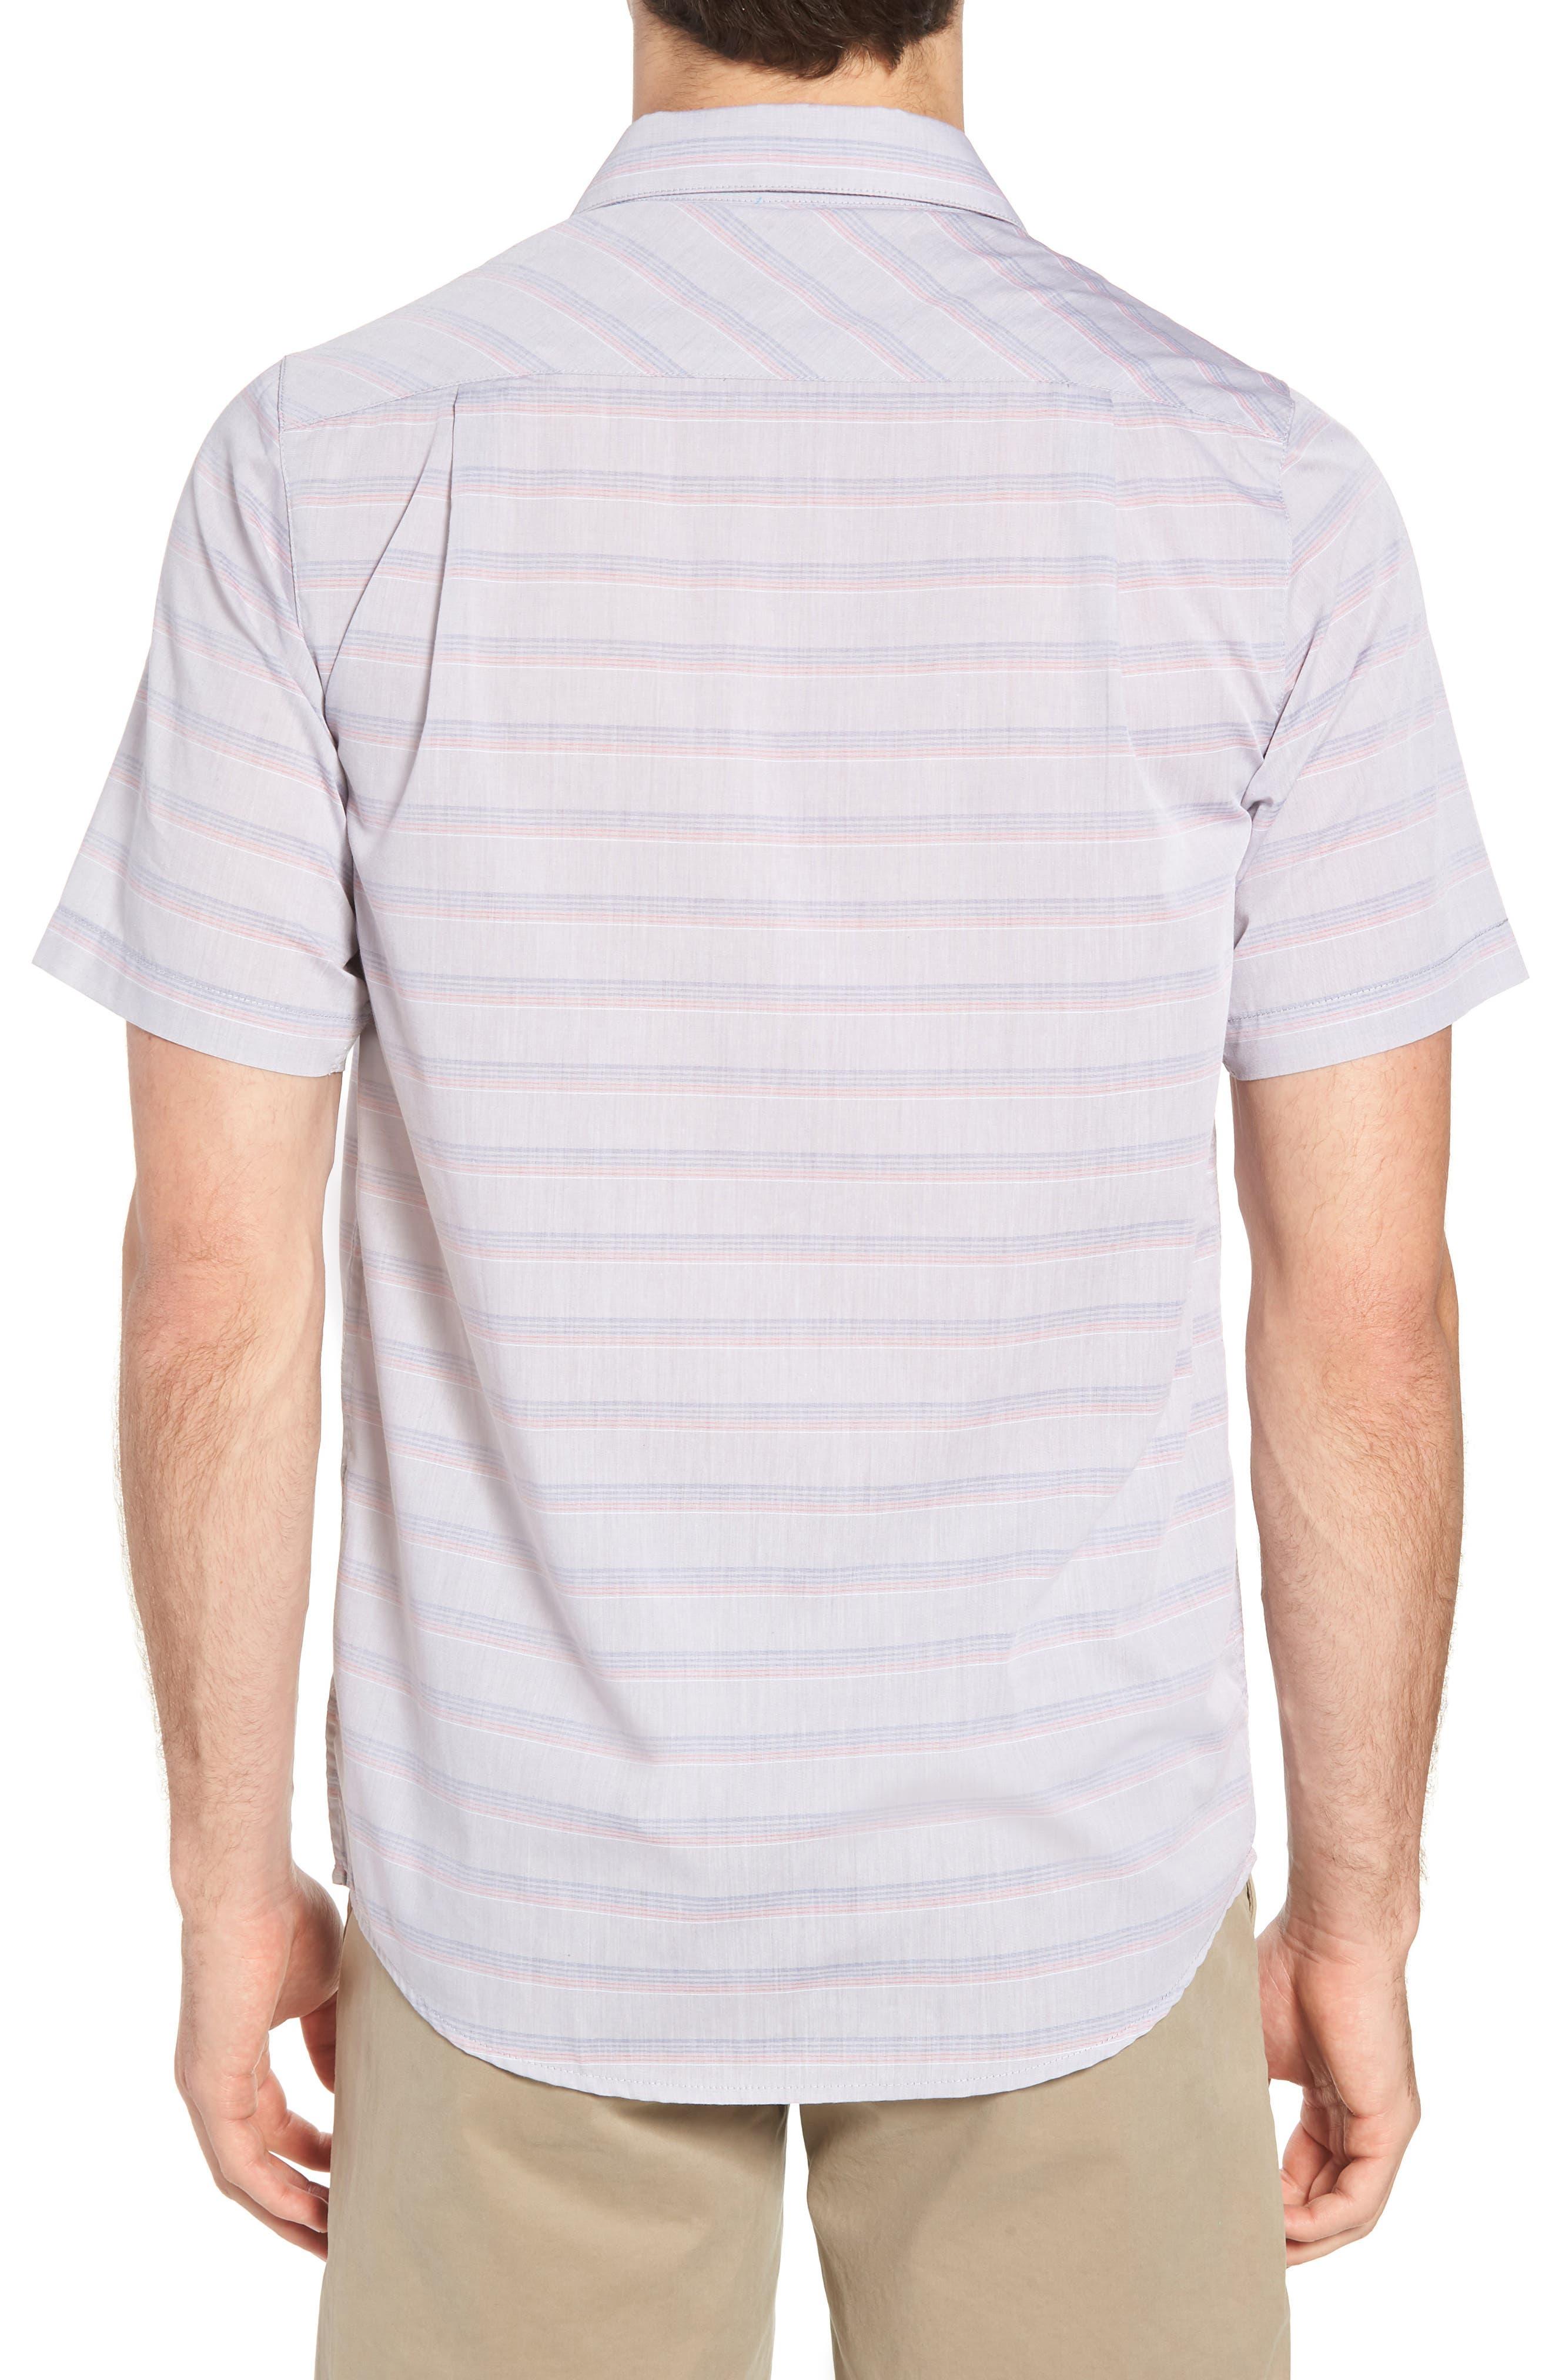 Comet Regular Fit Short Sleeve Sport Shirt,                             Alternate thumbnail 3, color,                             Heather Sharkskin